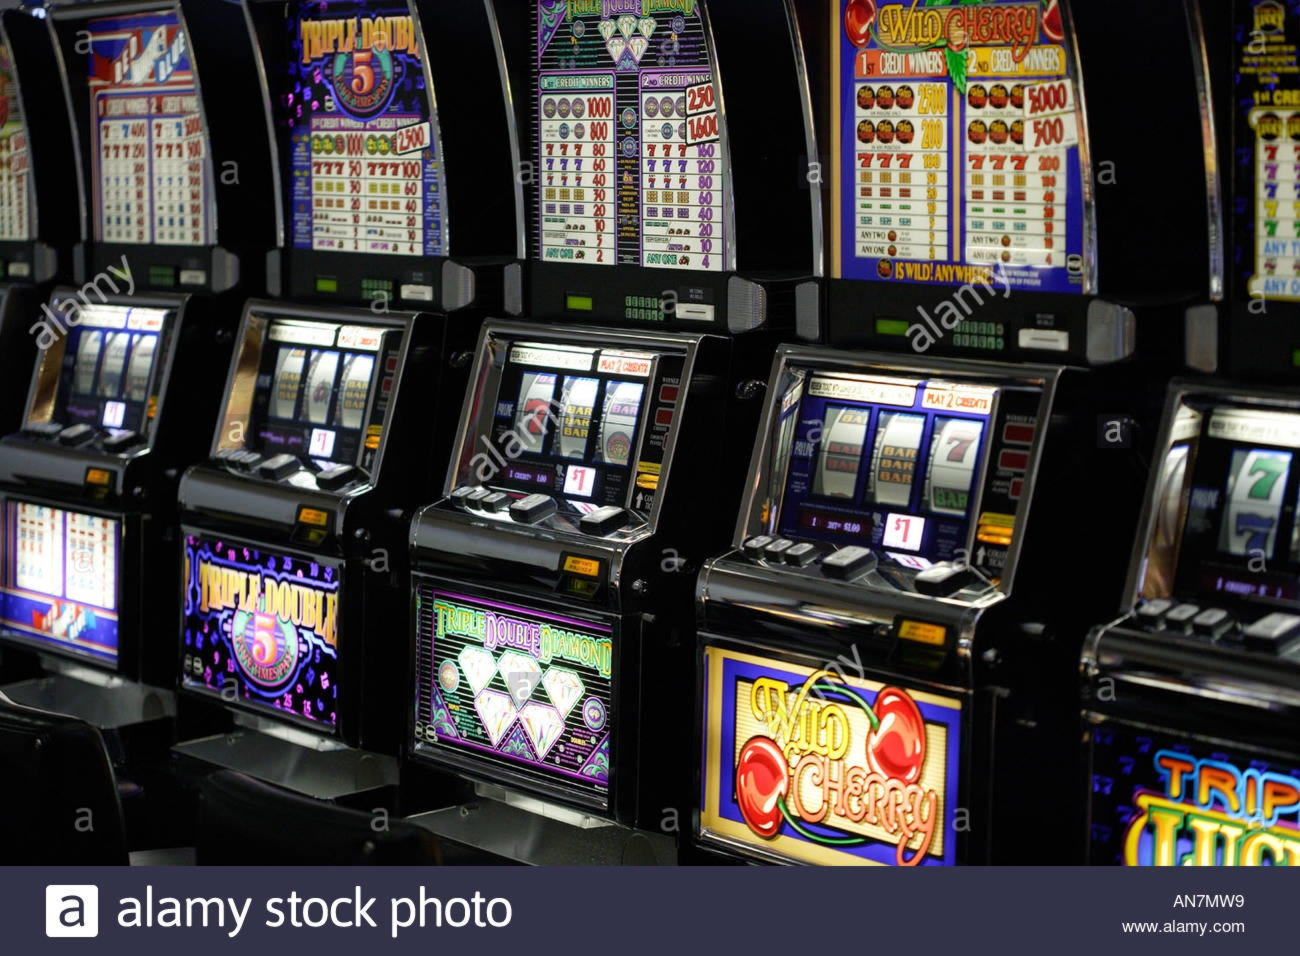 EURO 1635 TIDAK DEPOSIT BONUS CASINO di Bingo Besties